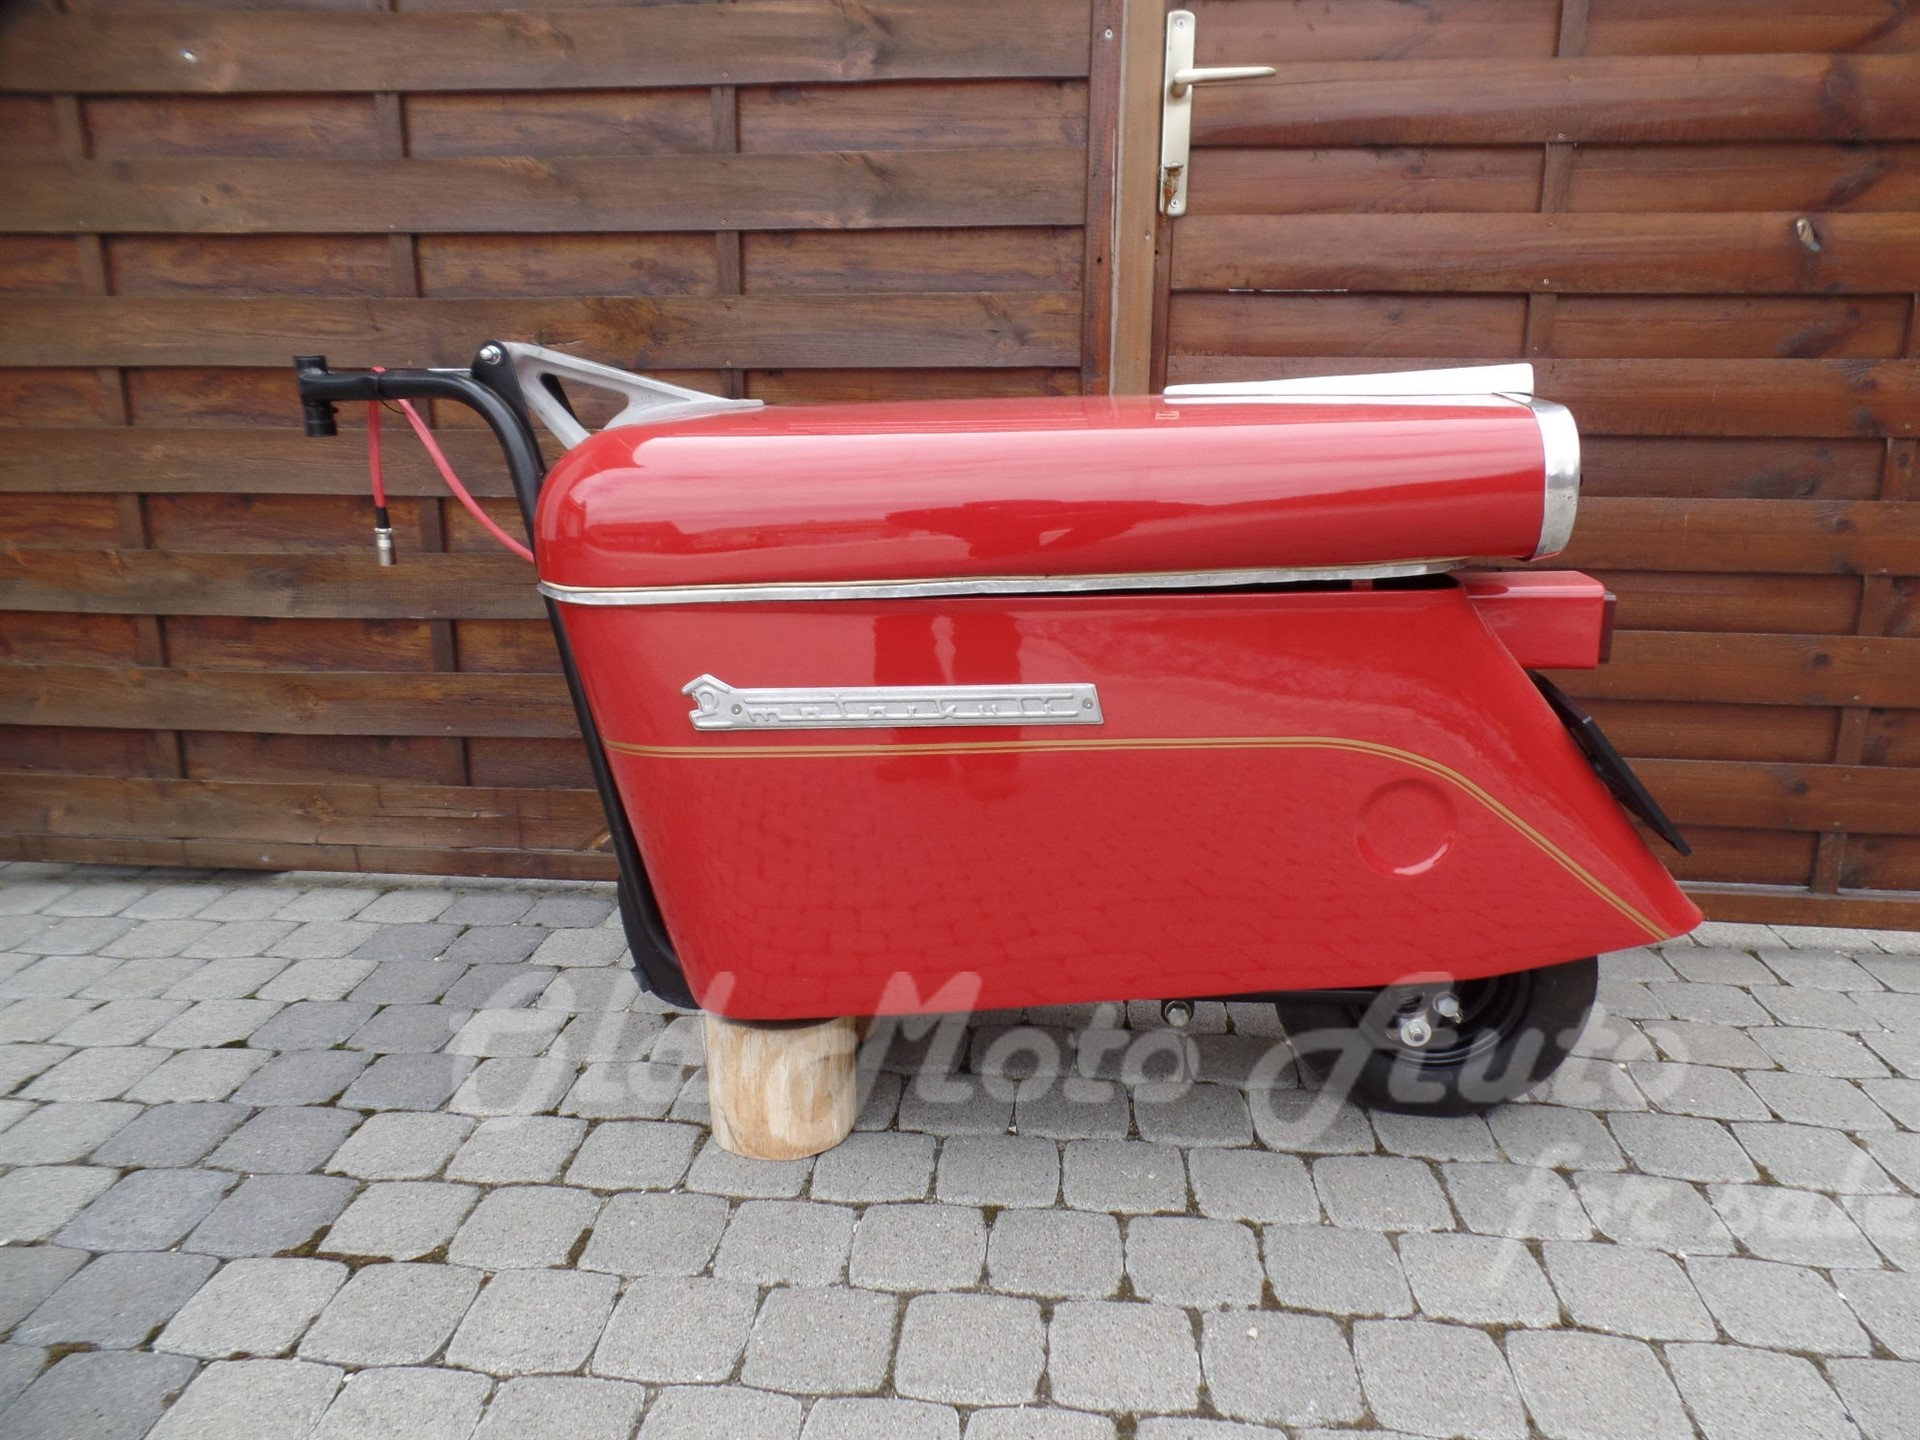 Motorkuli FV 60